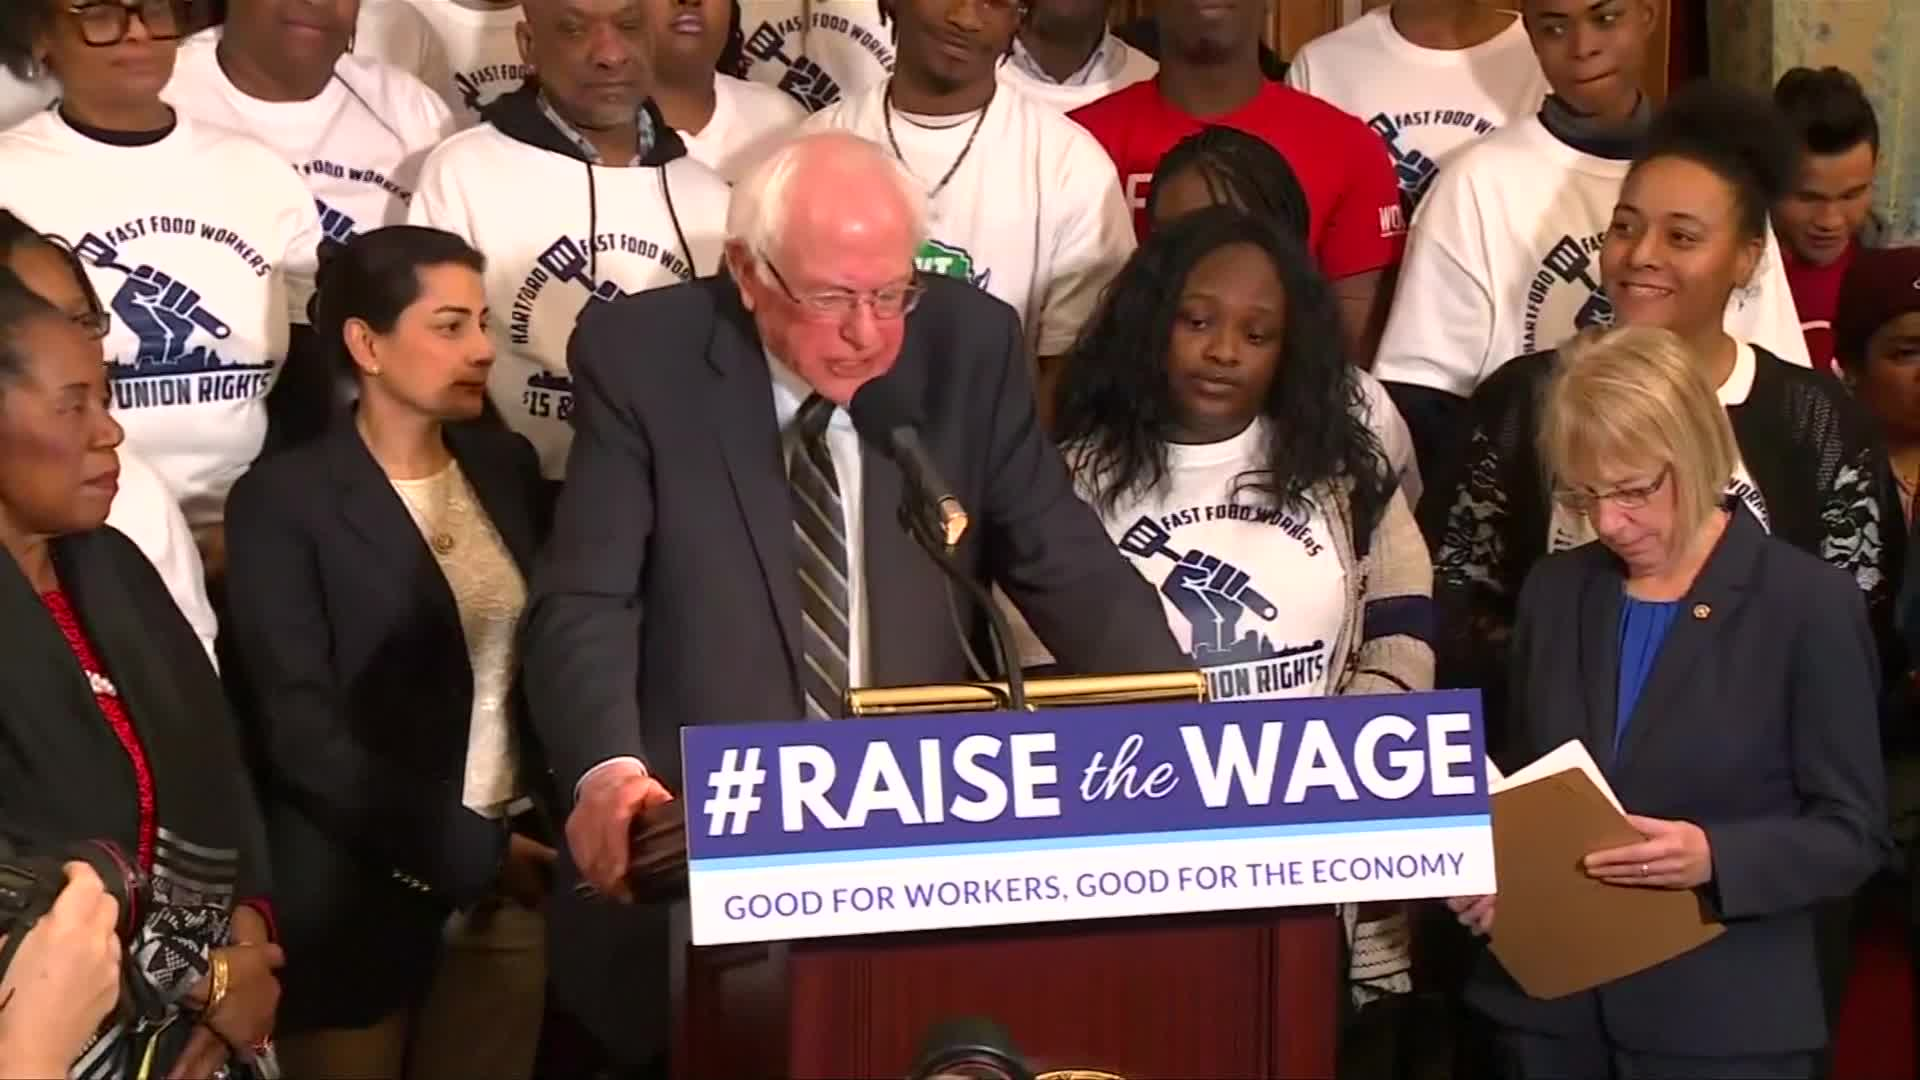 House Democrats Propose $15 Minimum Wage With New Majority